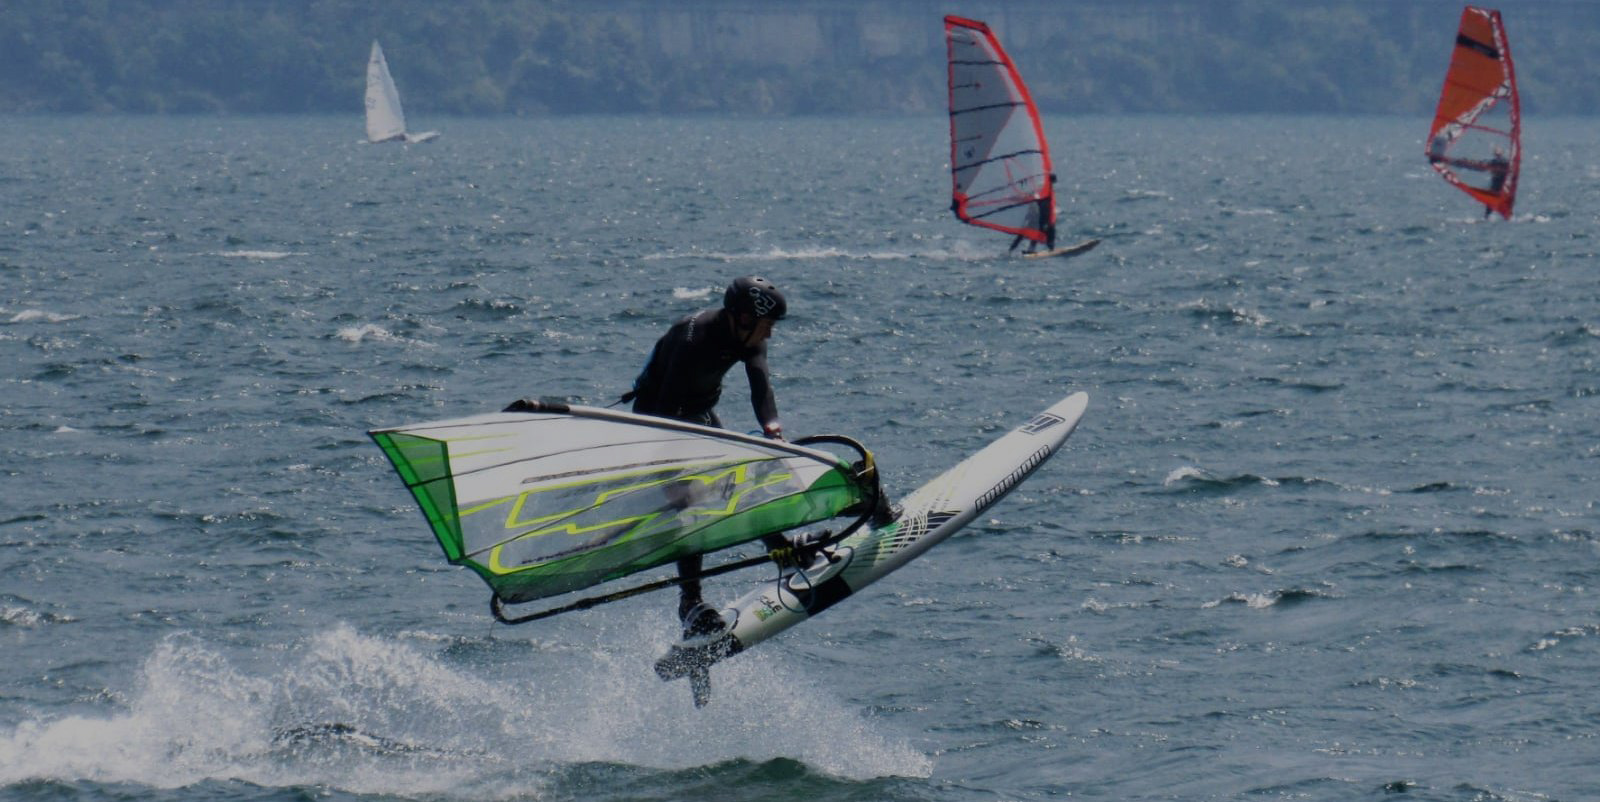 Campionato Windsurf Freestyle Under 20